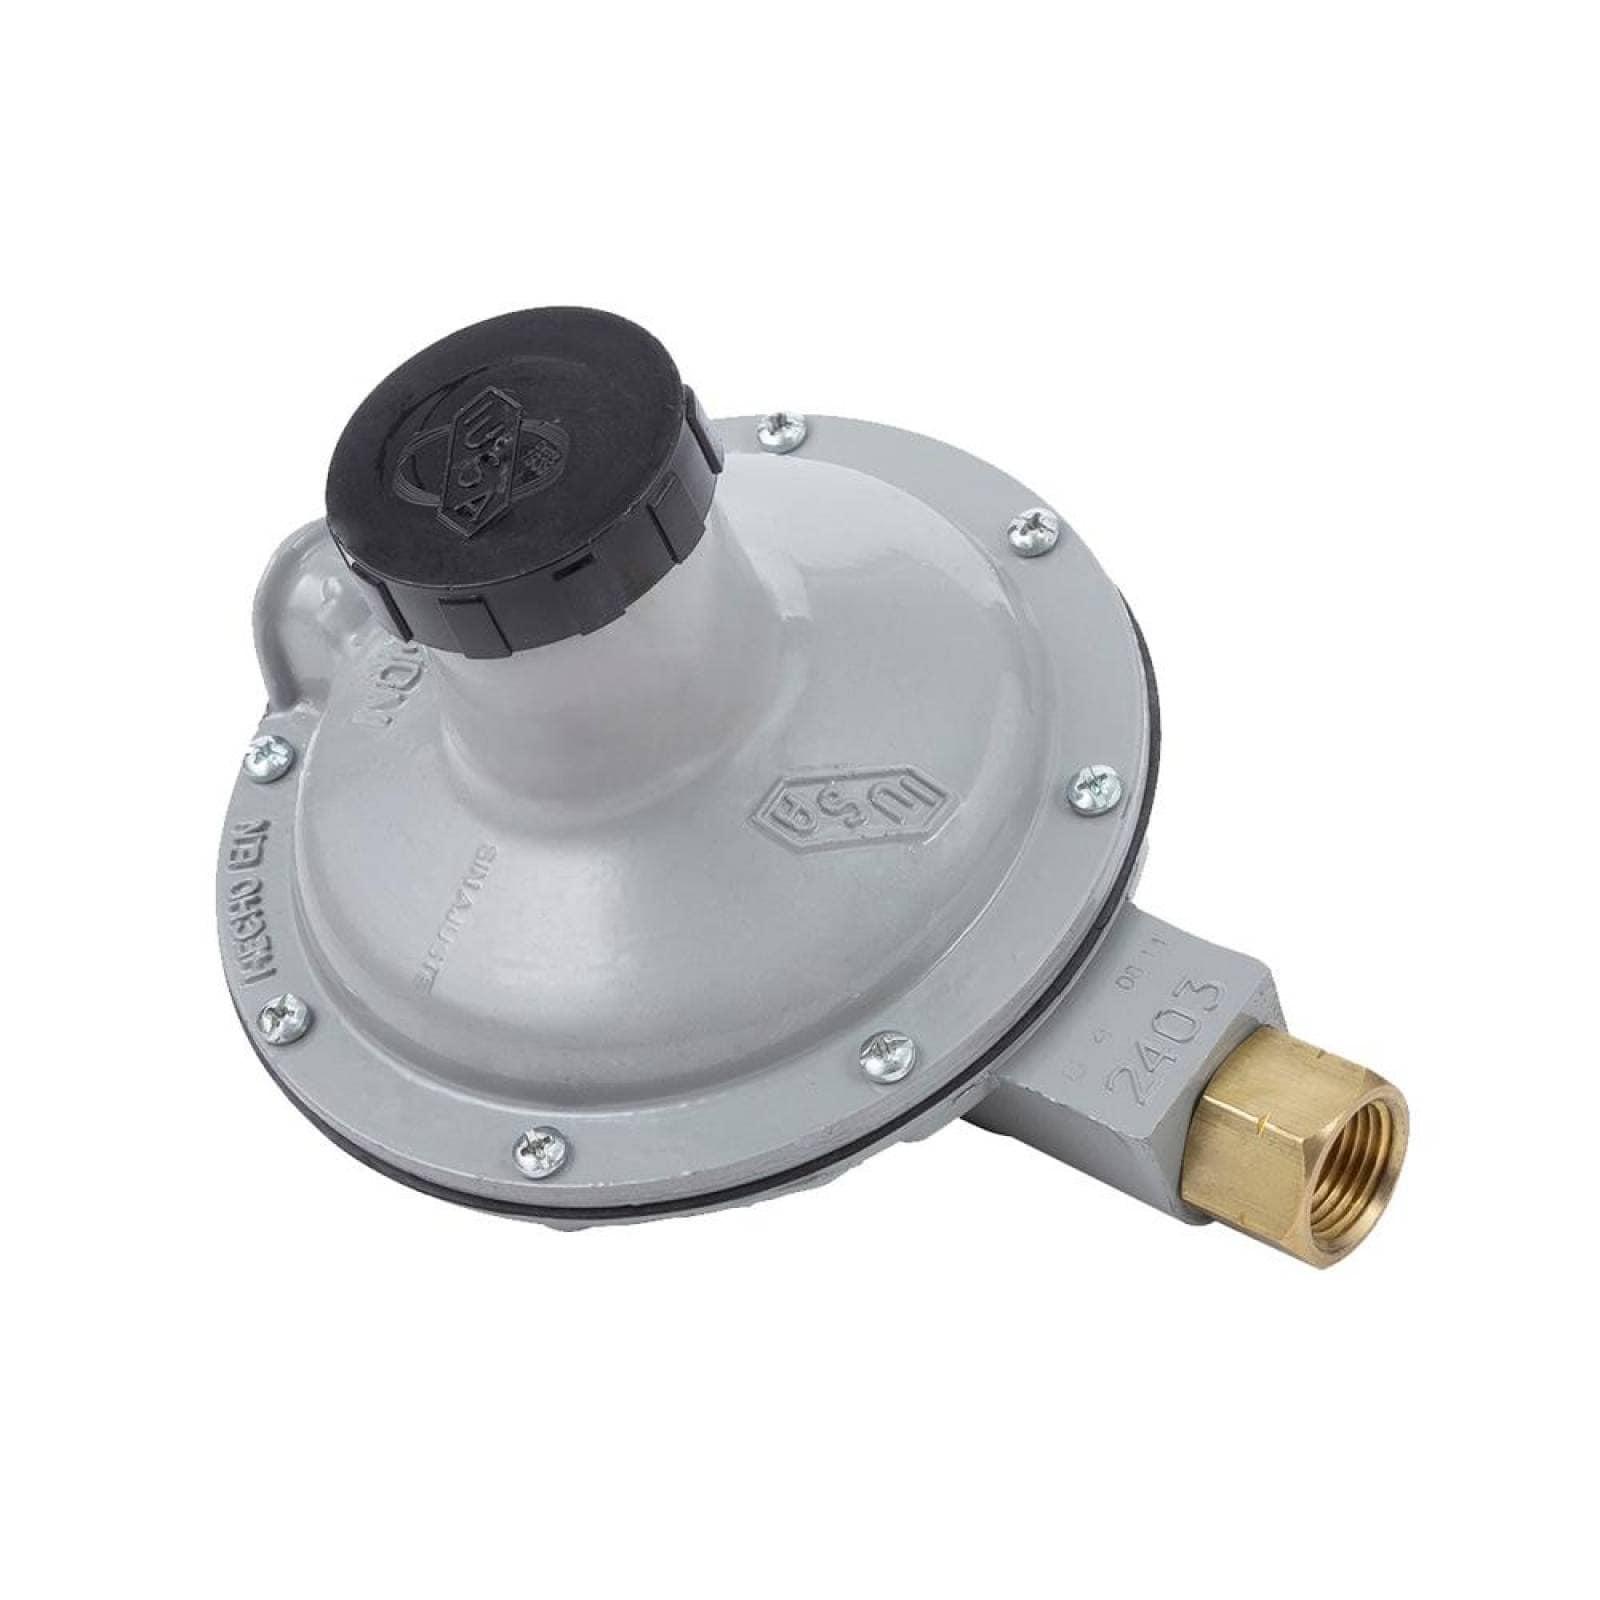 Regulador Para Gas L.P. Baja presión 1 vía 2403-C4